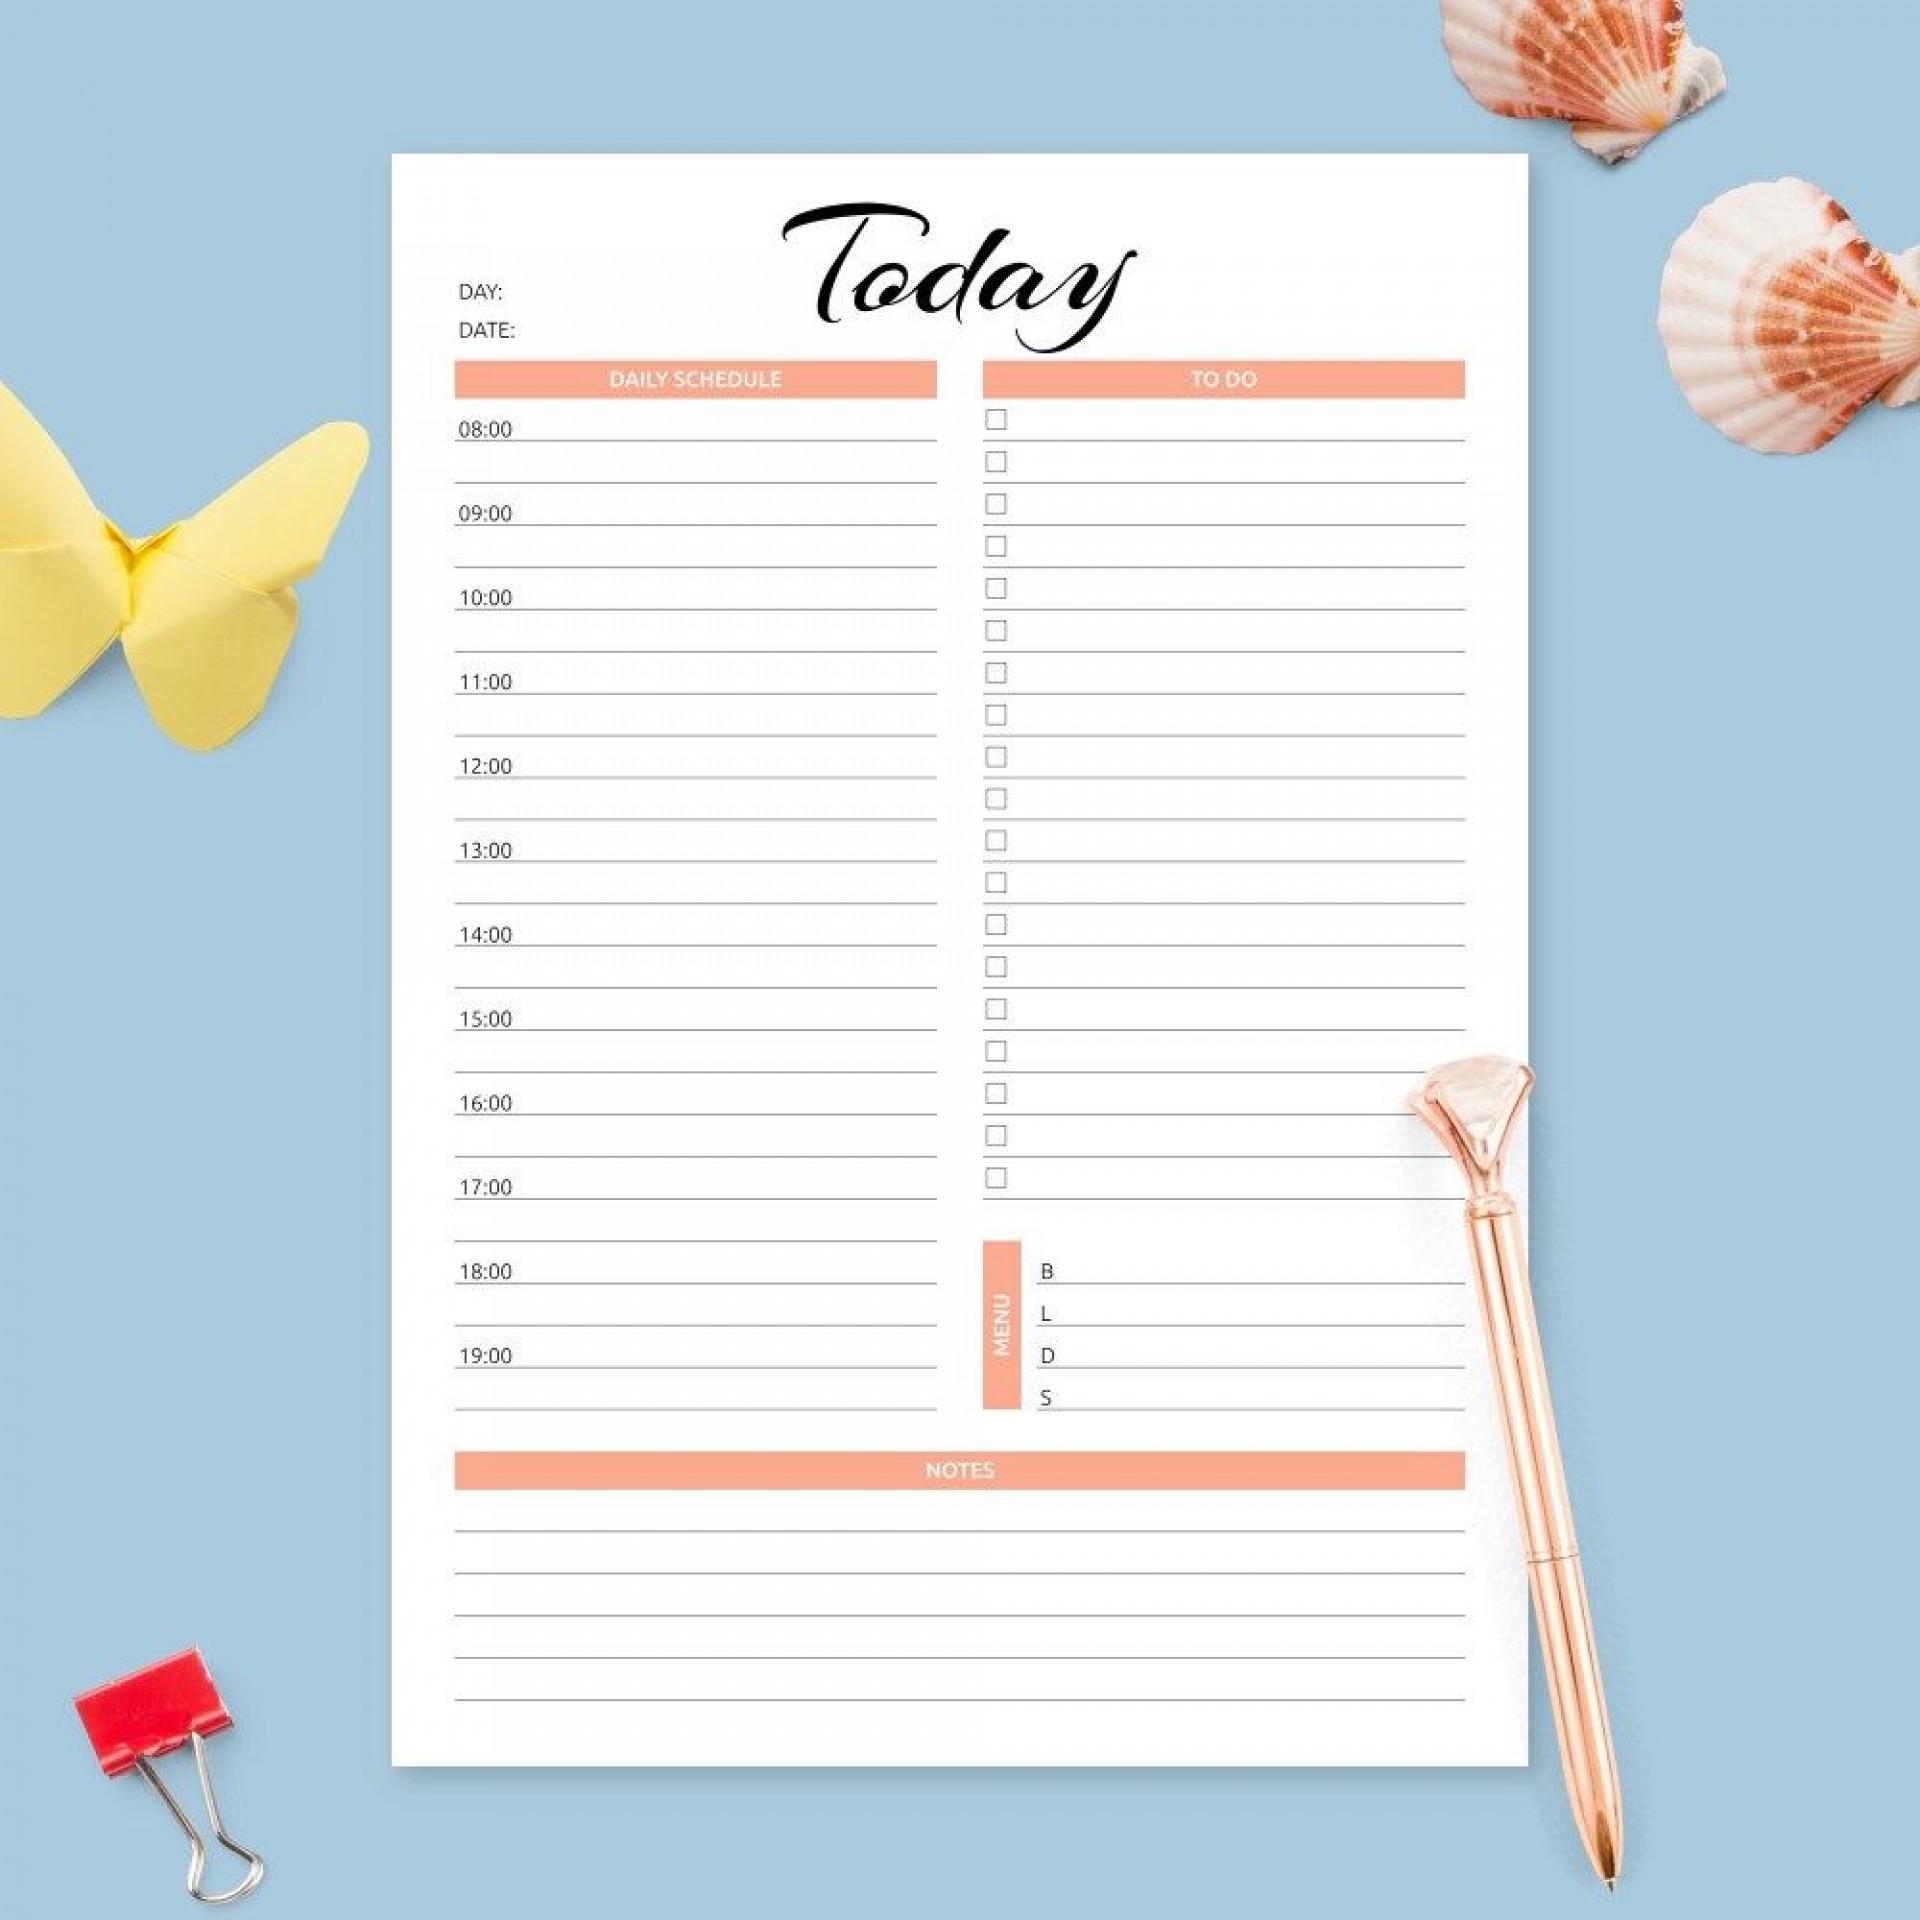 004 Formidable Hourly Calendar Template Word Design  24 Hour1920